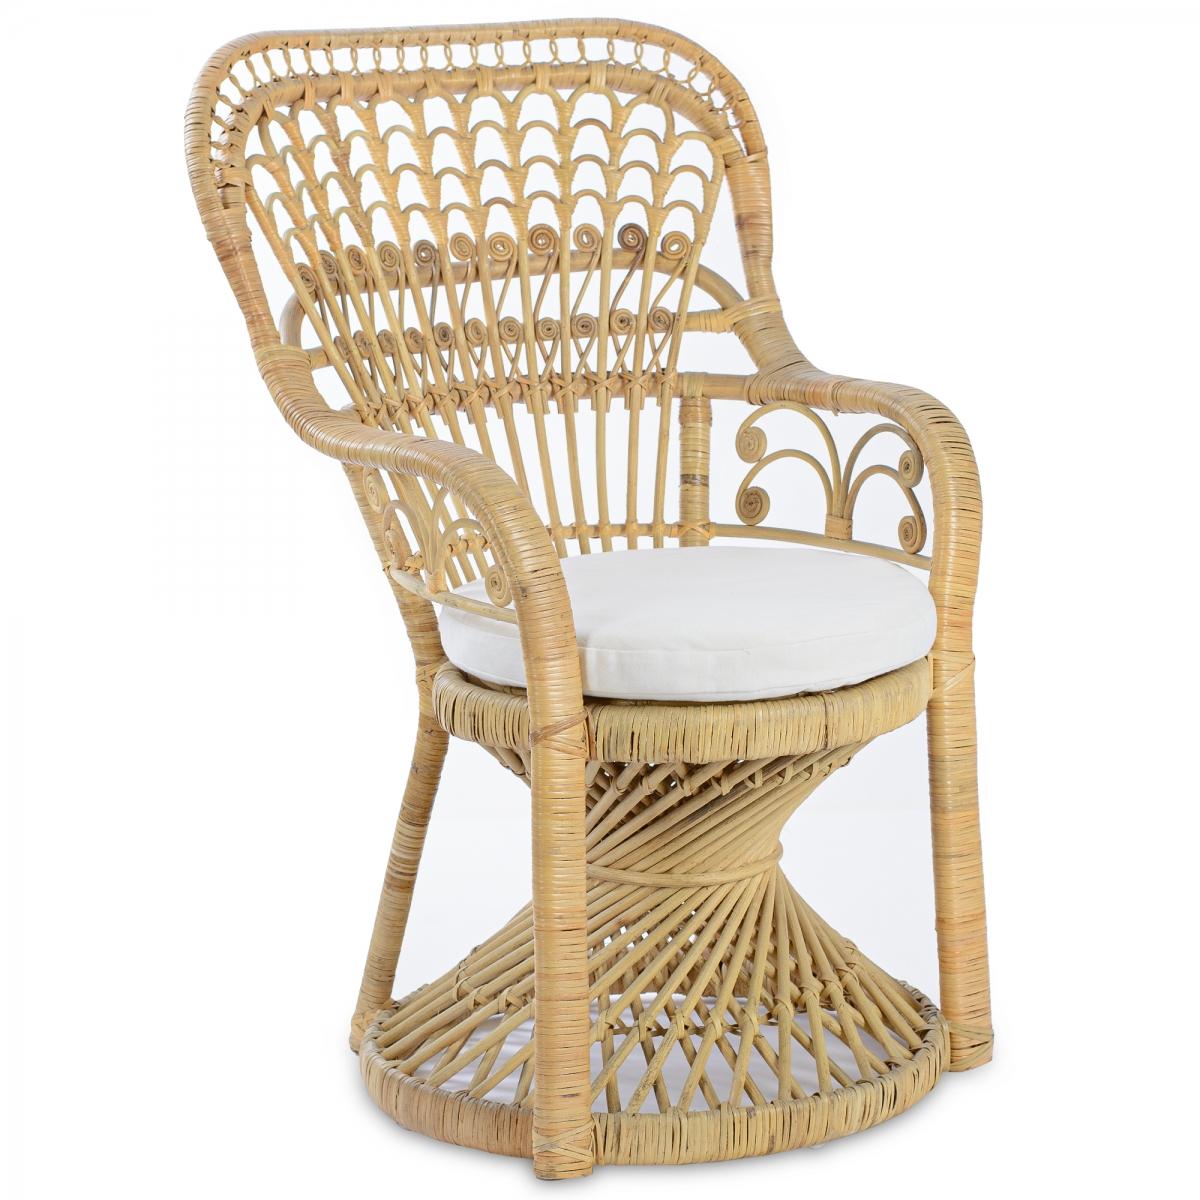 Уличное кресло Wicker Chair ротанг  - фото 1